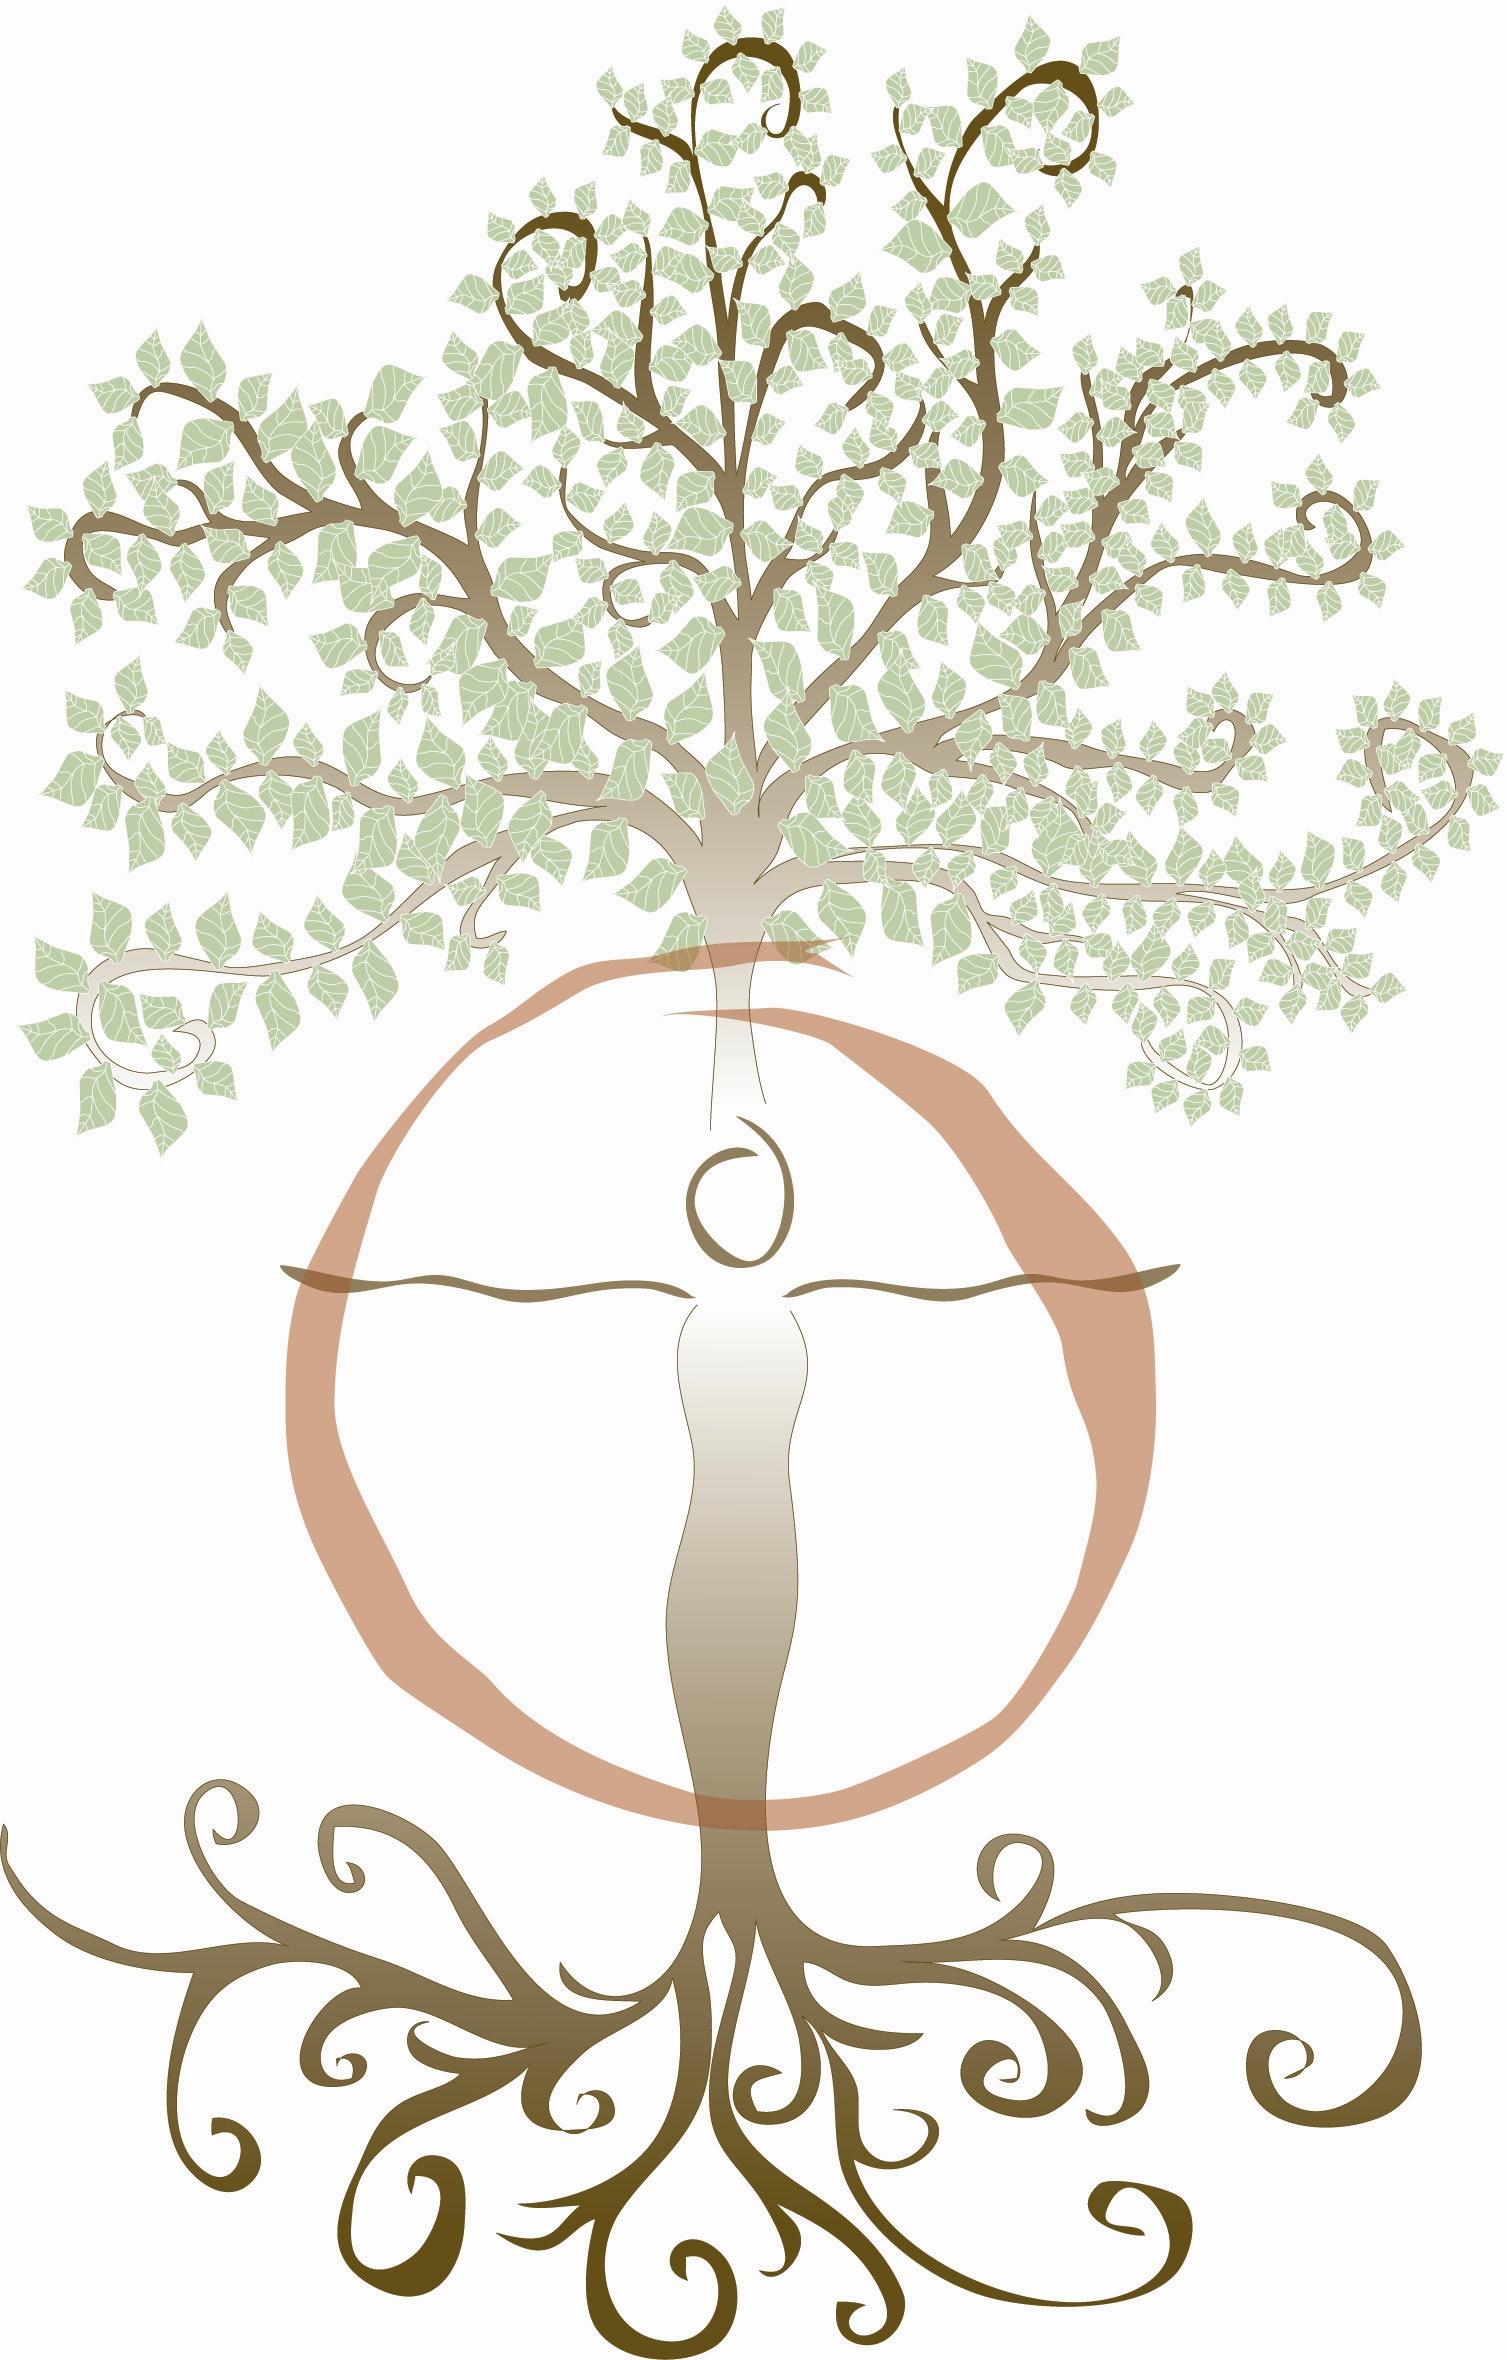 1-soma-earth-tree-woman-logo.jpg